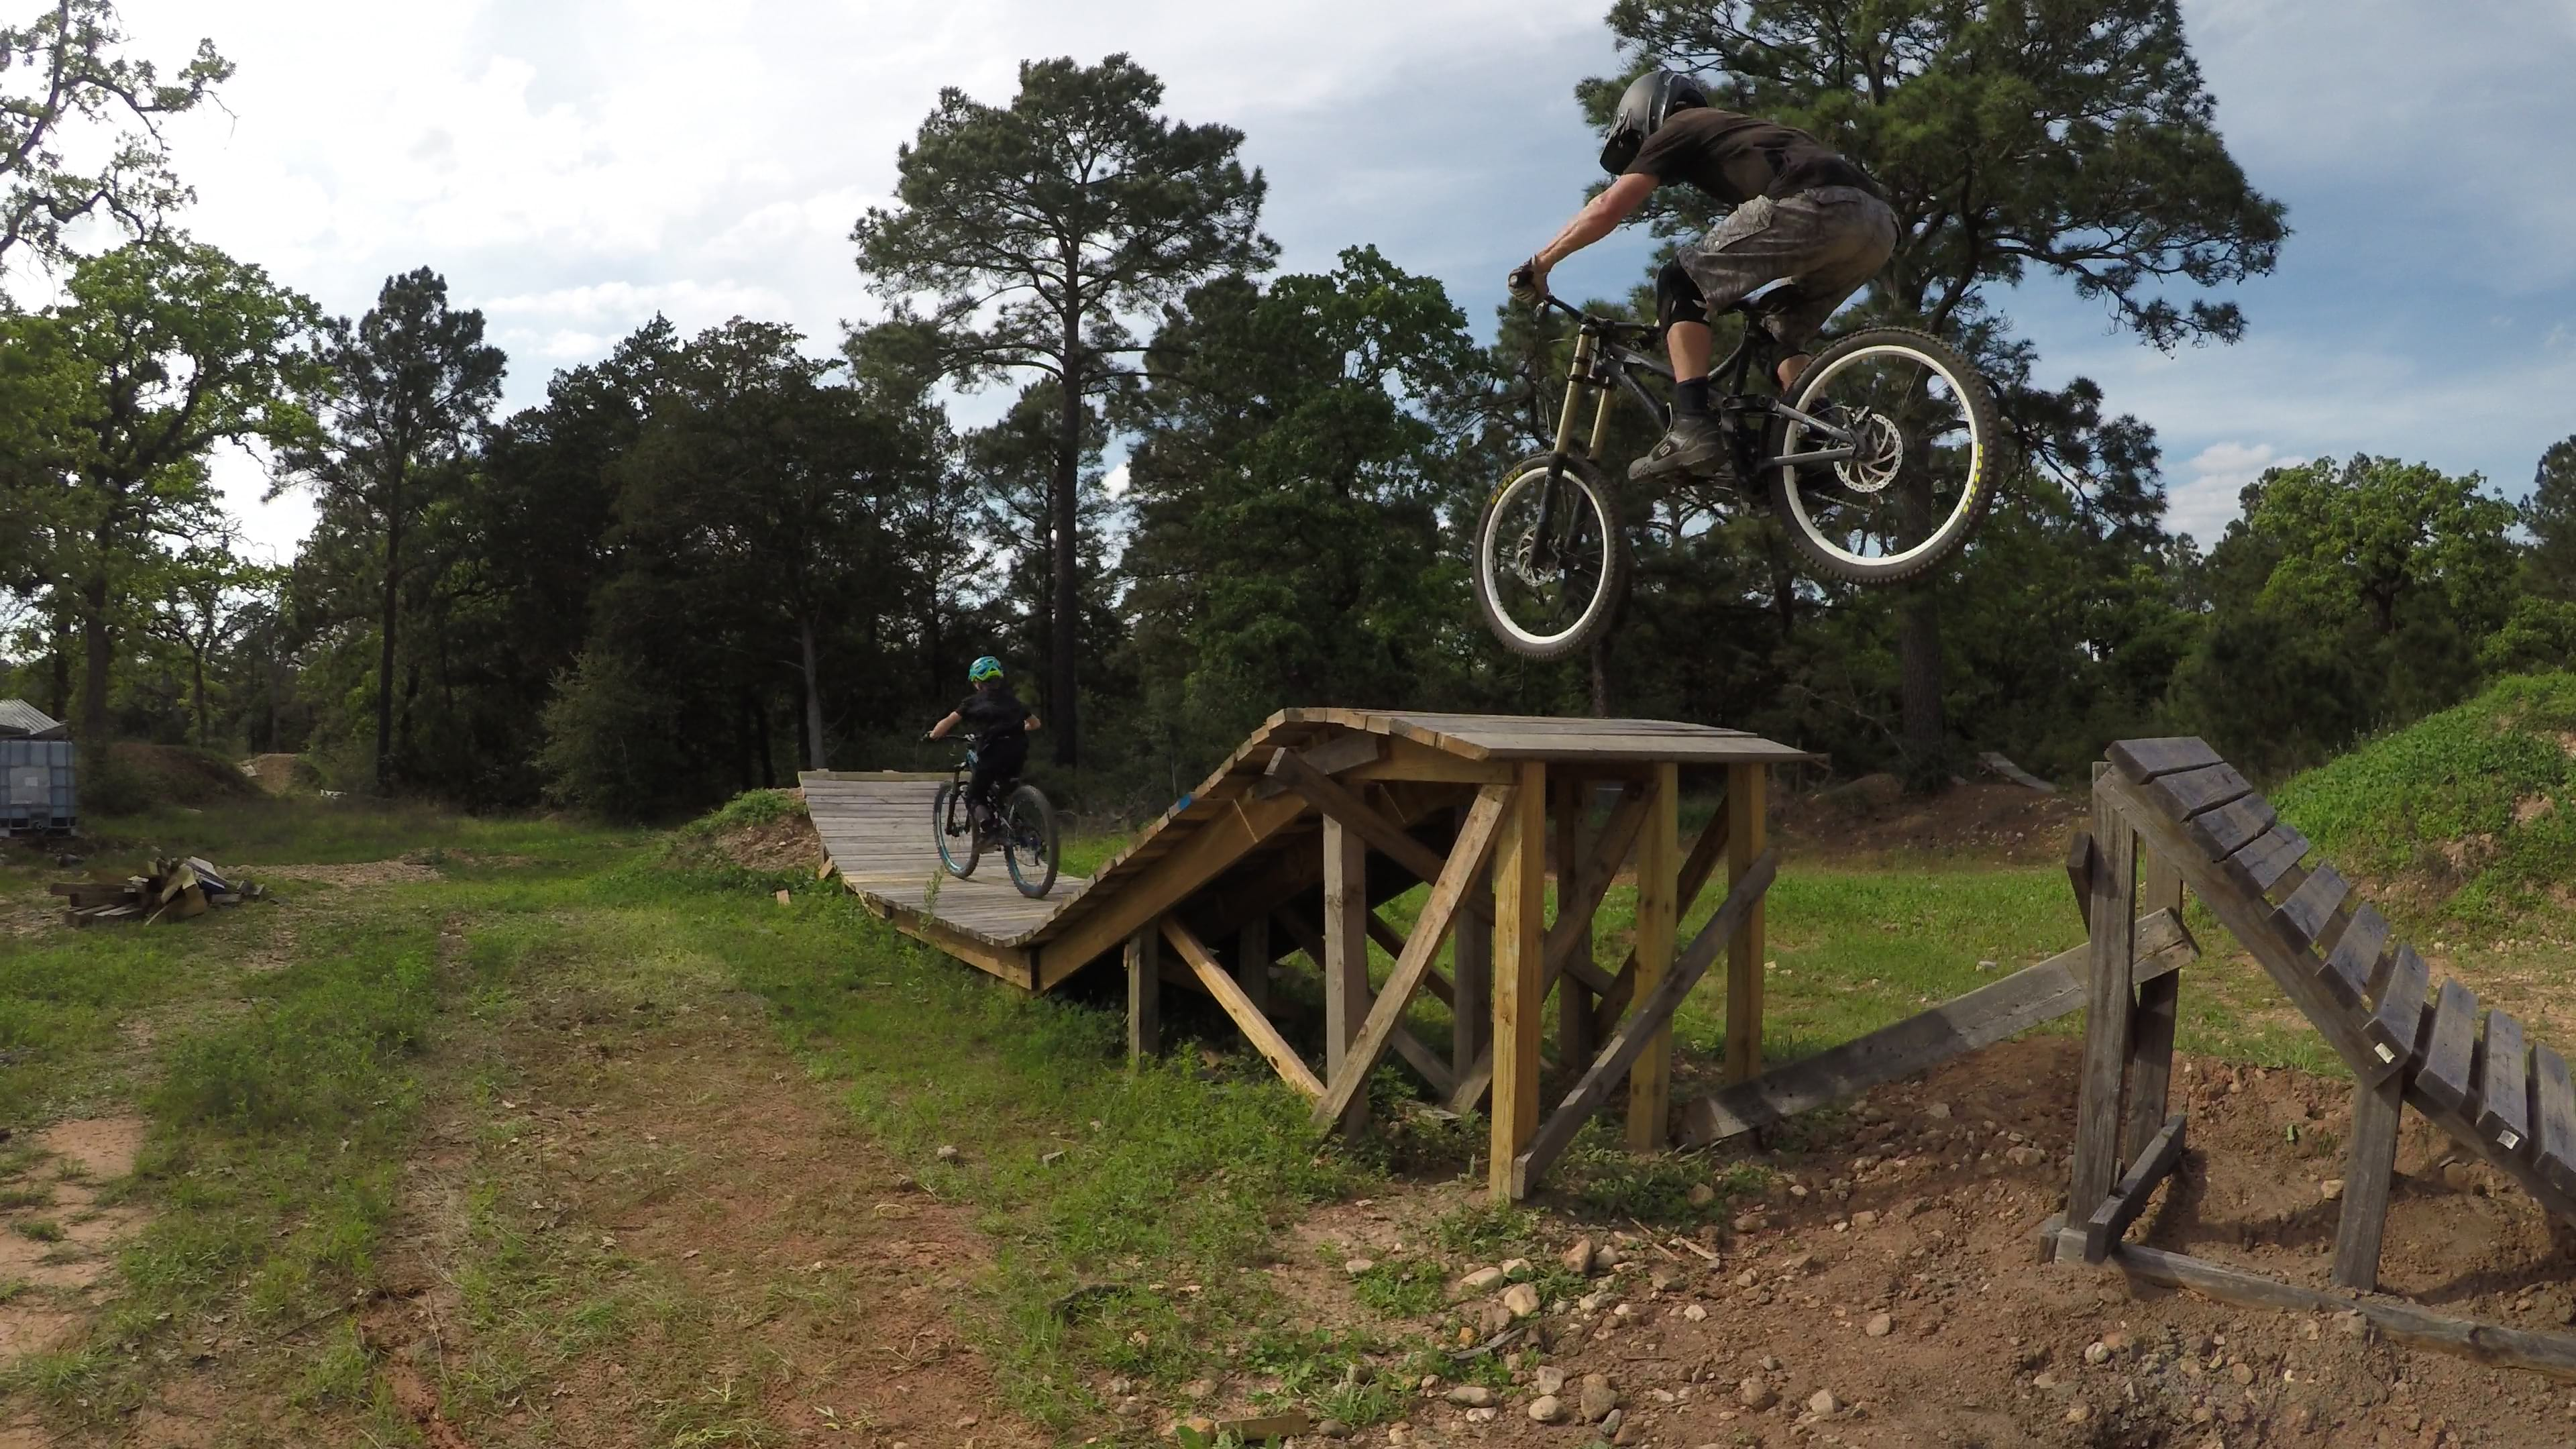 Best Texas Biking Trails For Freeride By Freeride512